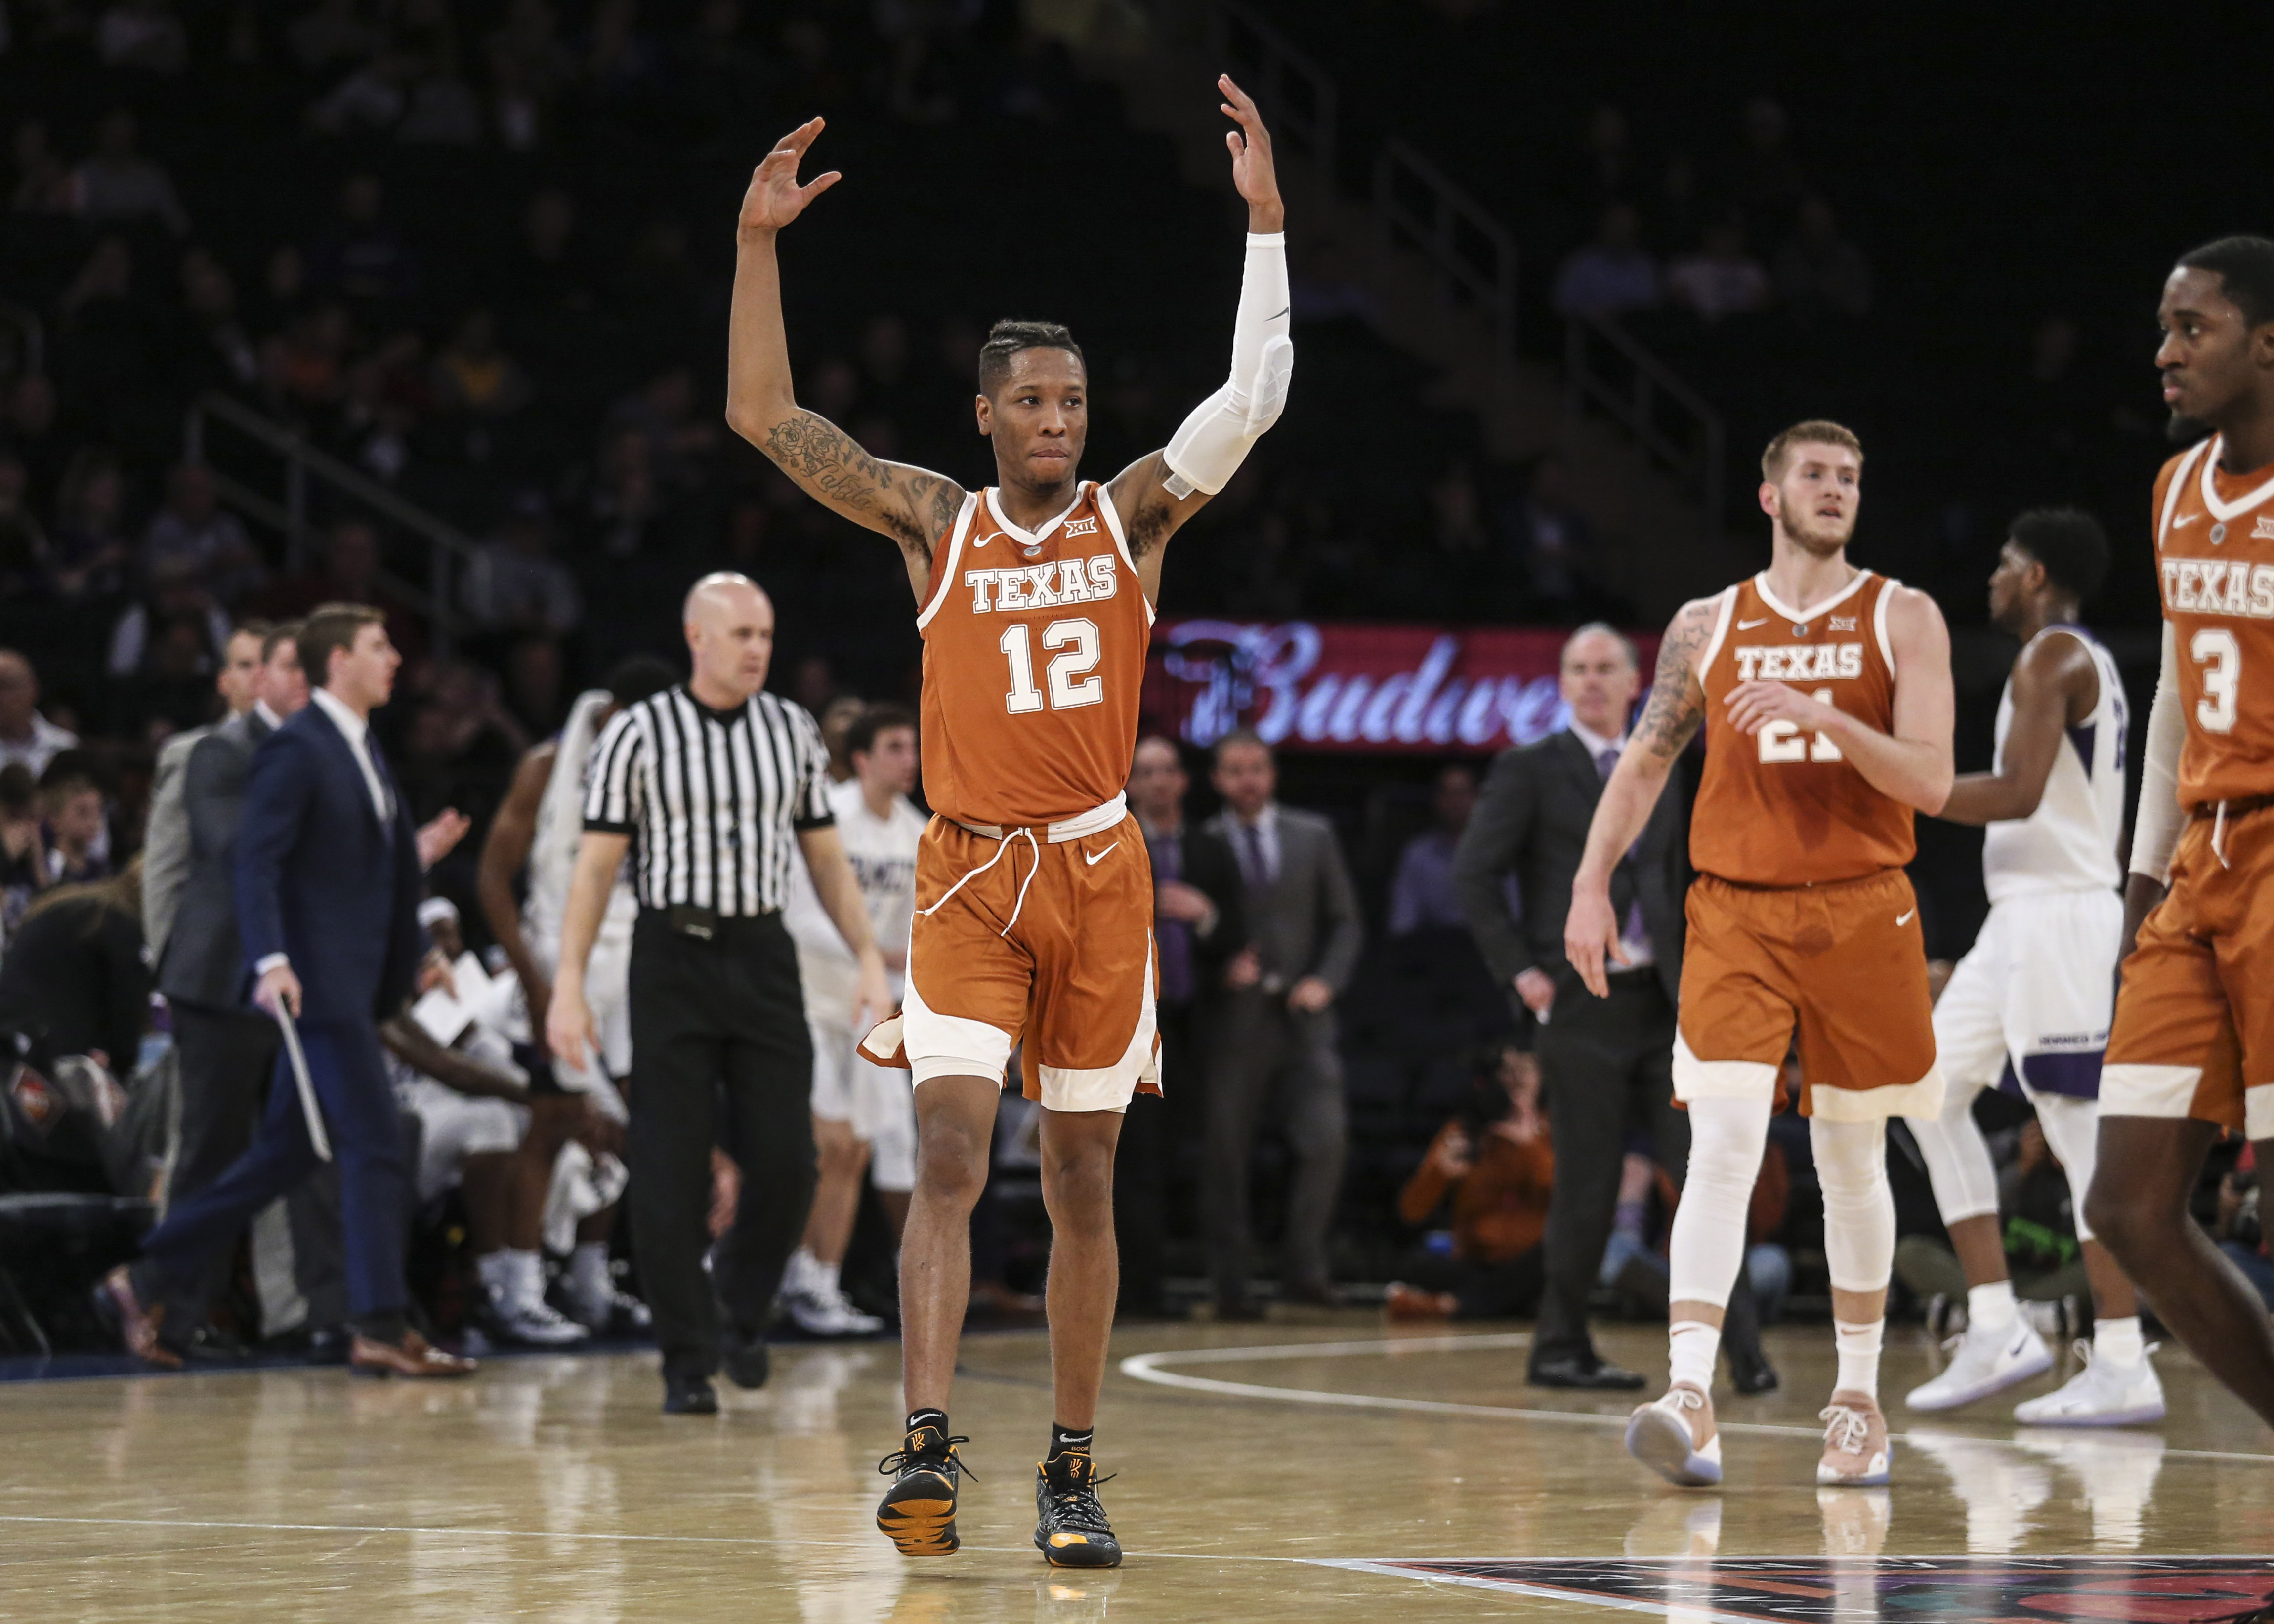 NCAA Basketball: NIT Semifinal-Texas vs TCU